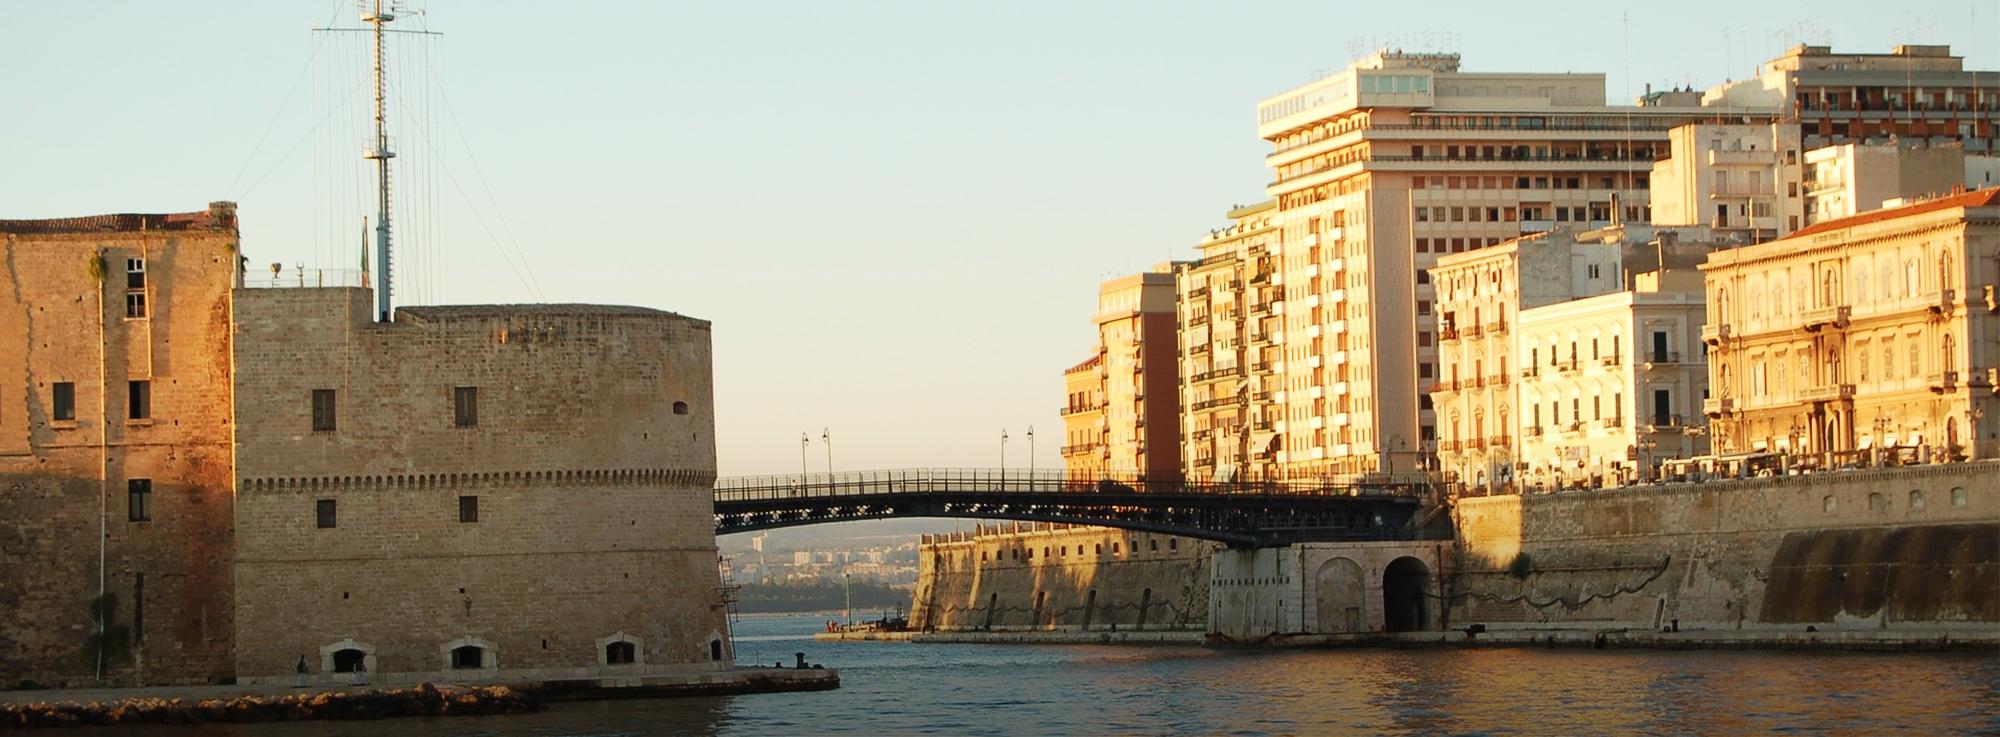 Taranto: Ti racconto una storia